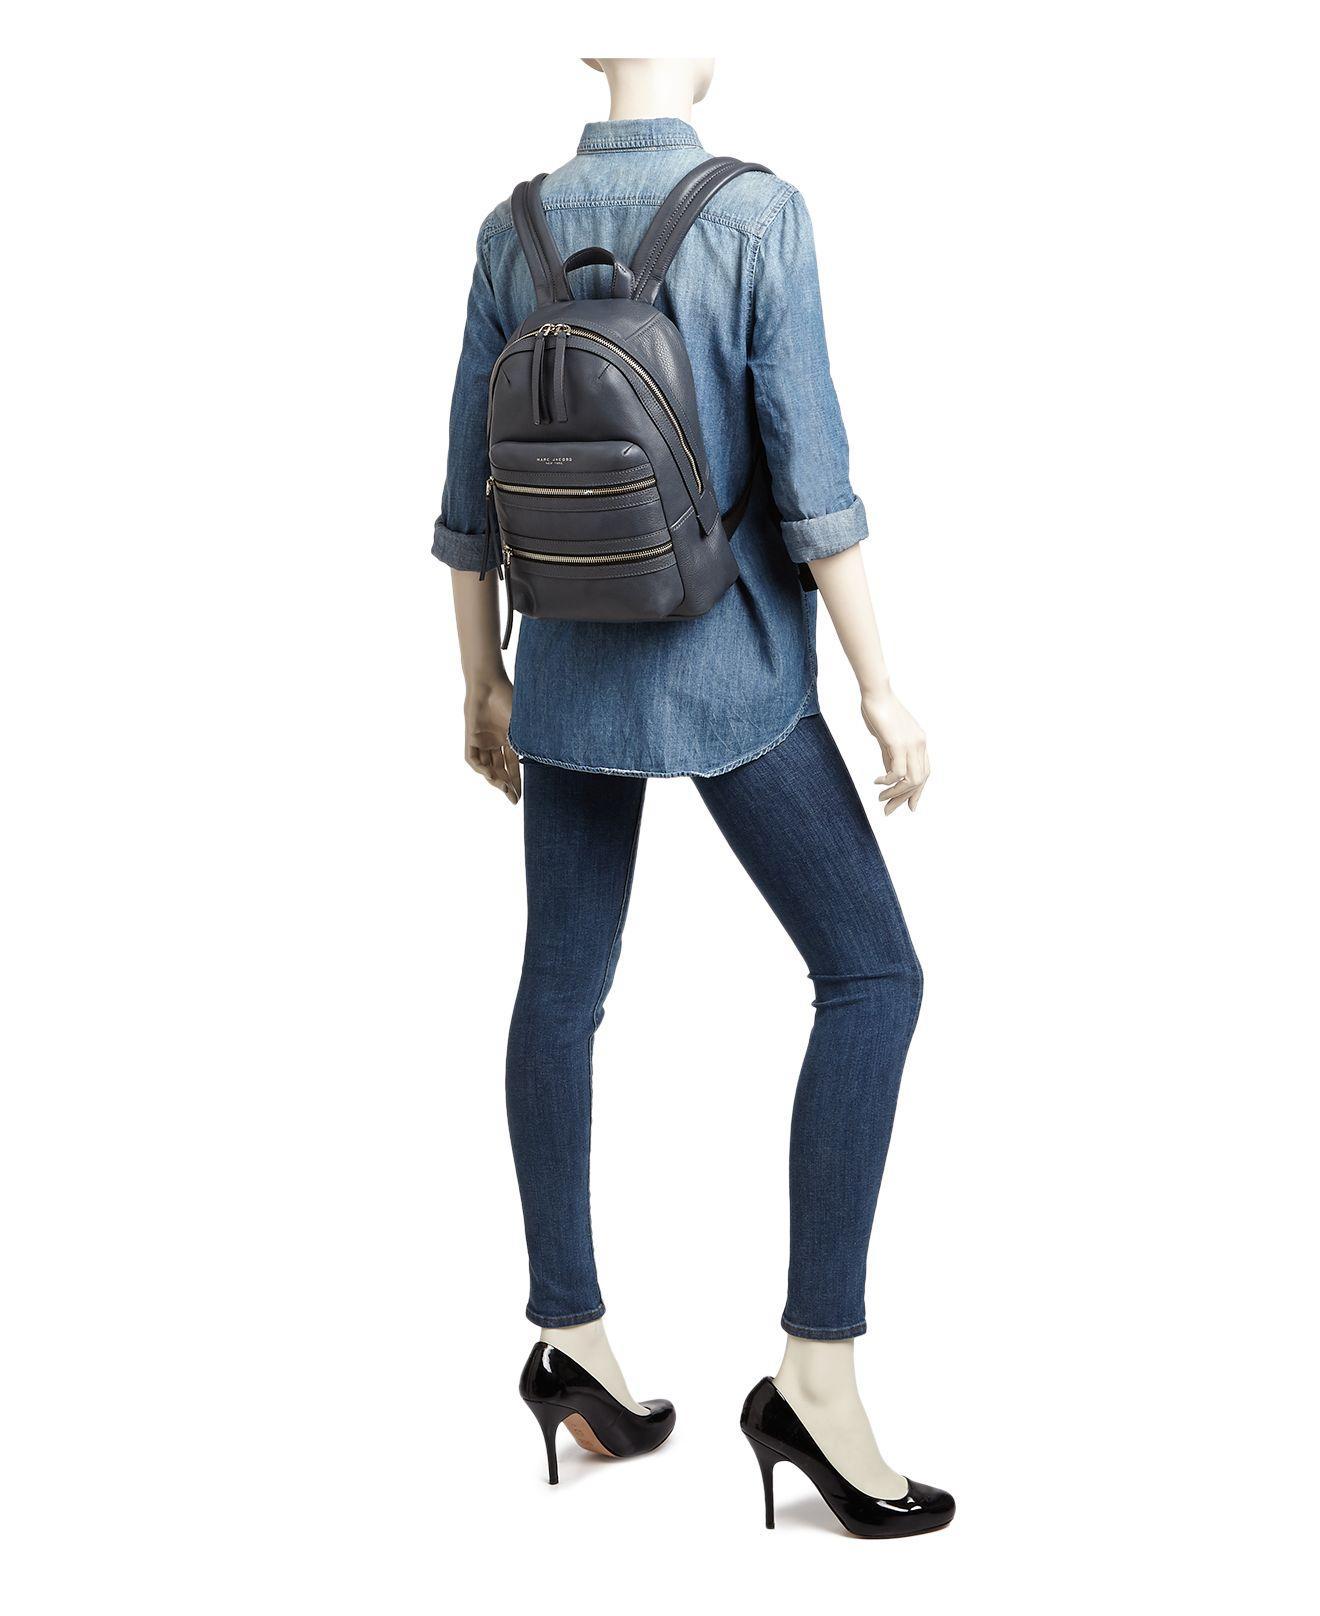 Marc Jacobs Leather Biker Backpack in Teal (Black)